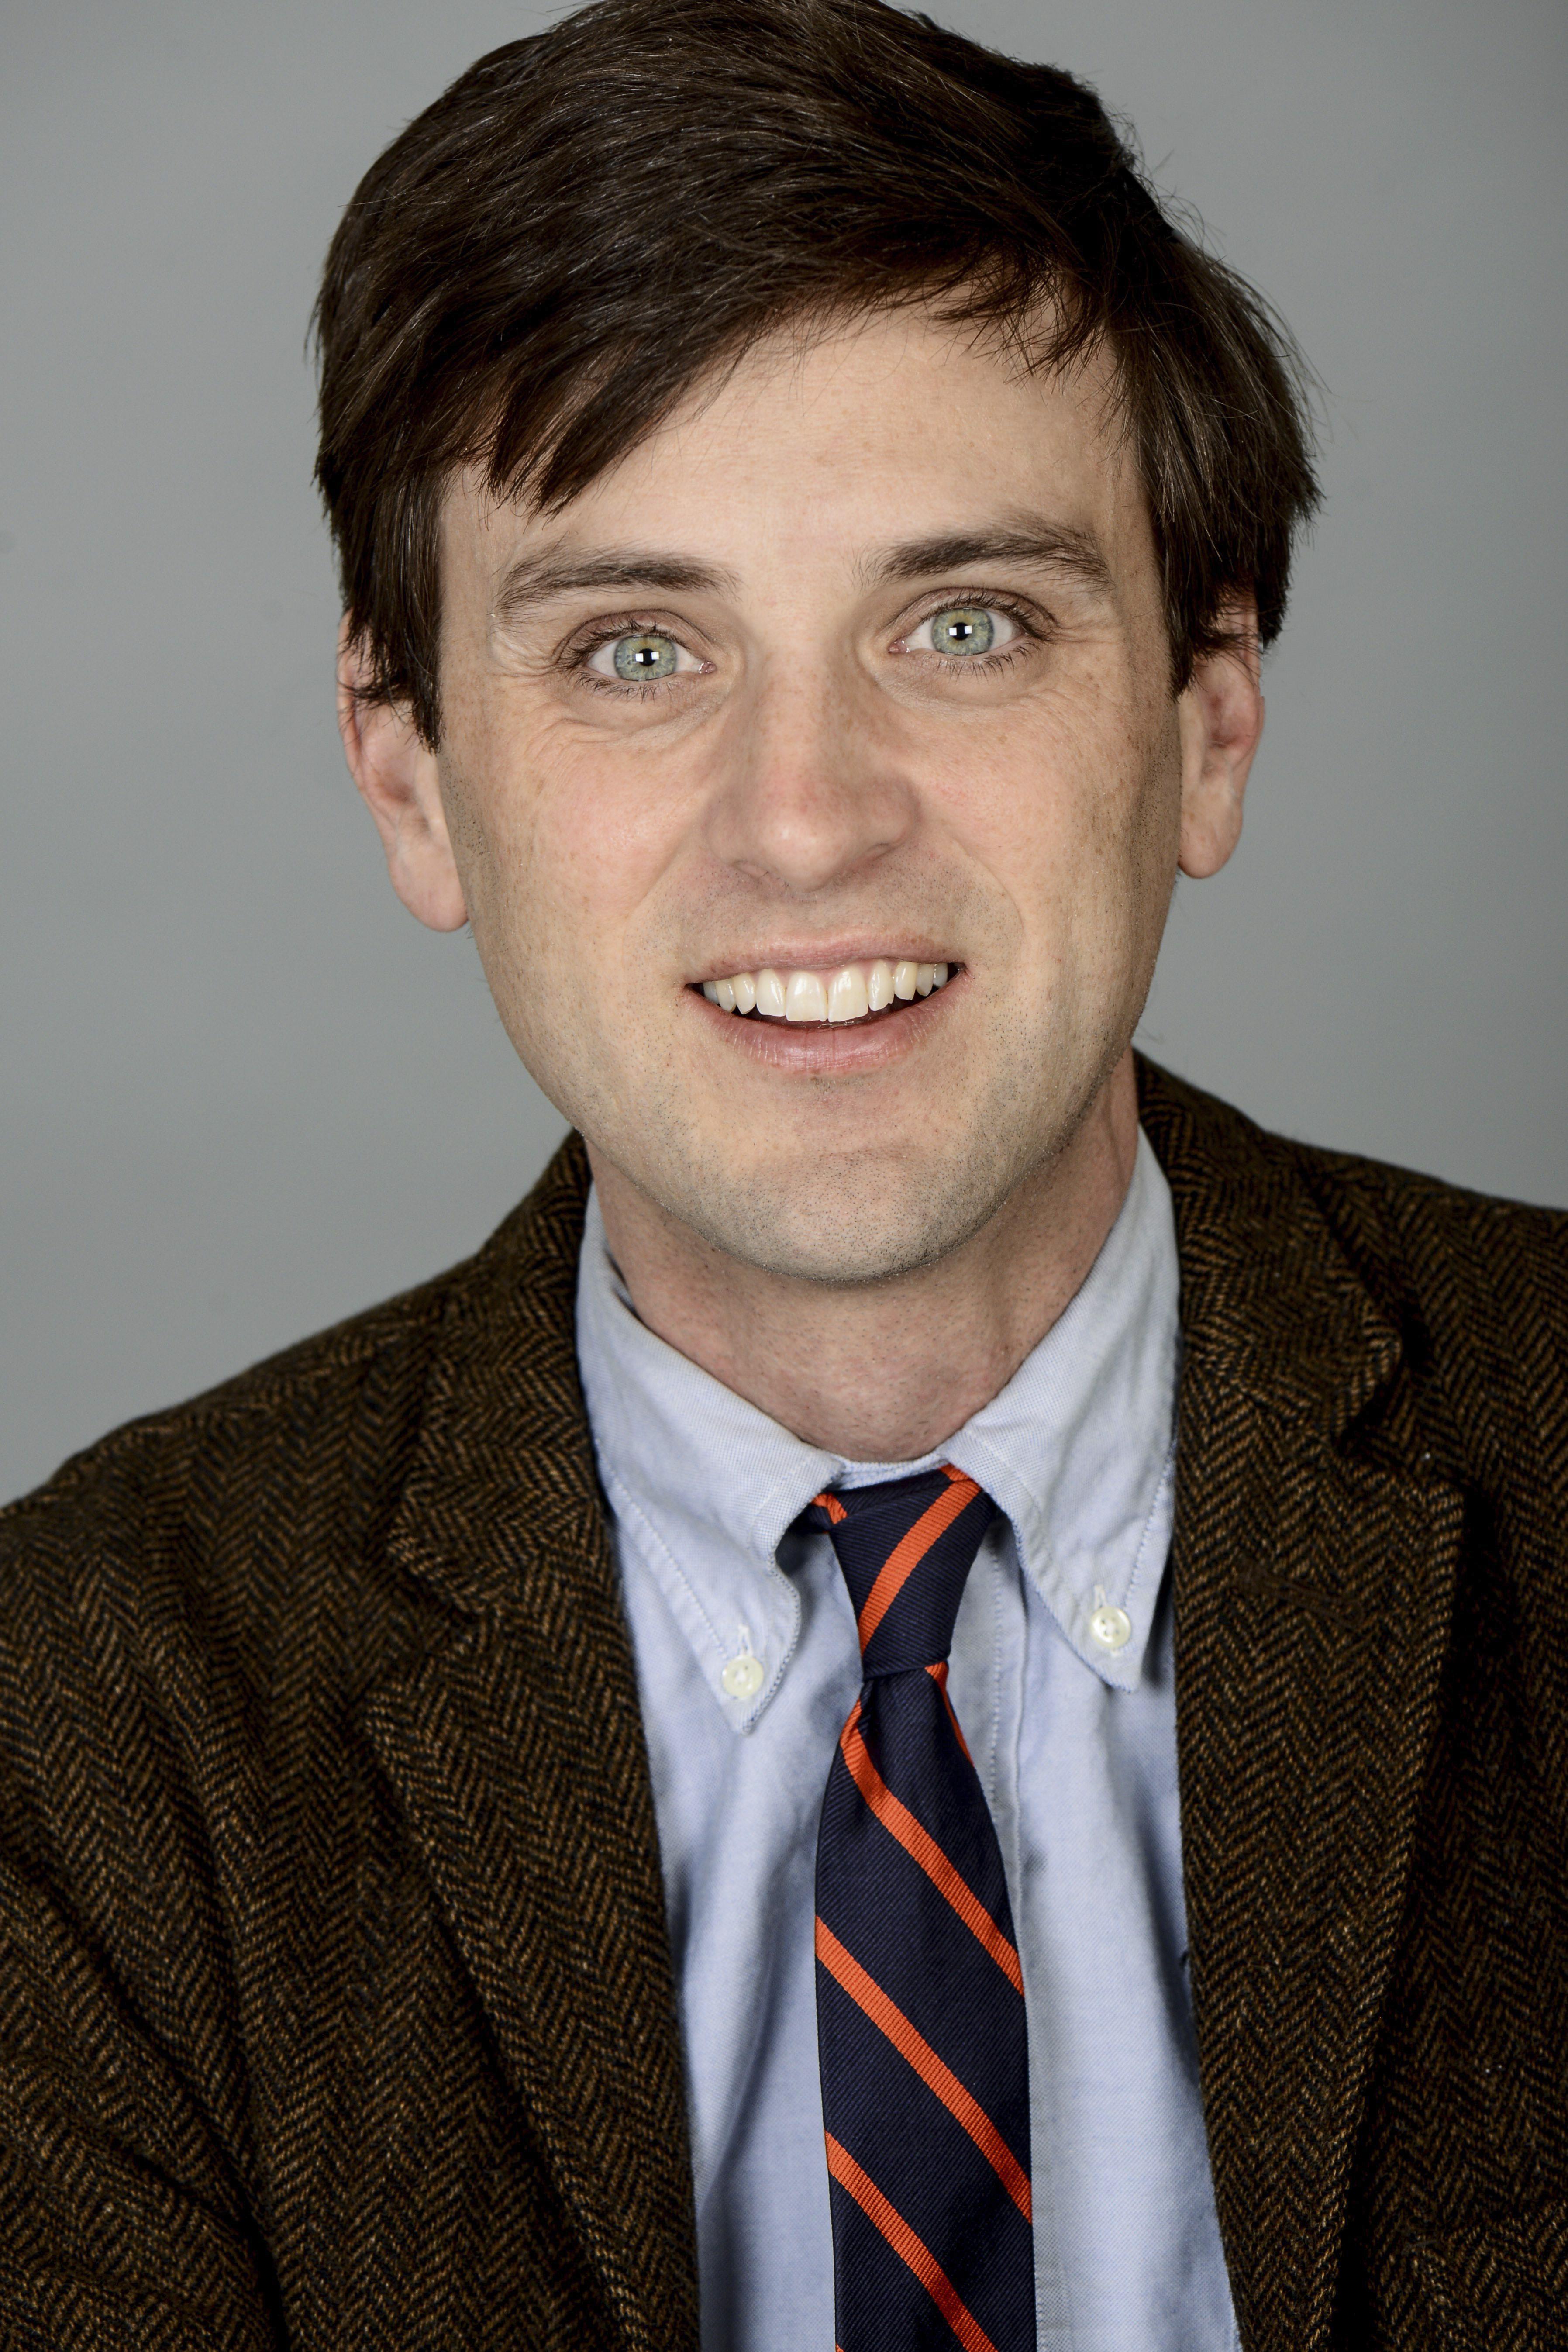 Chris Willard